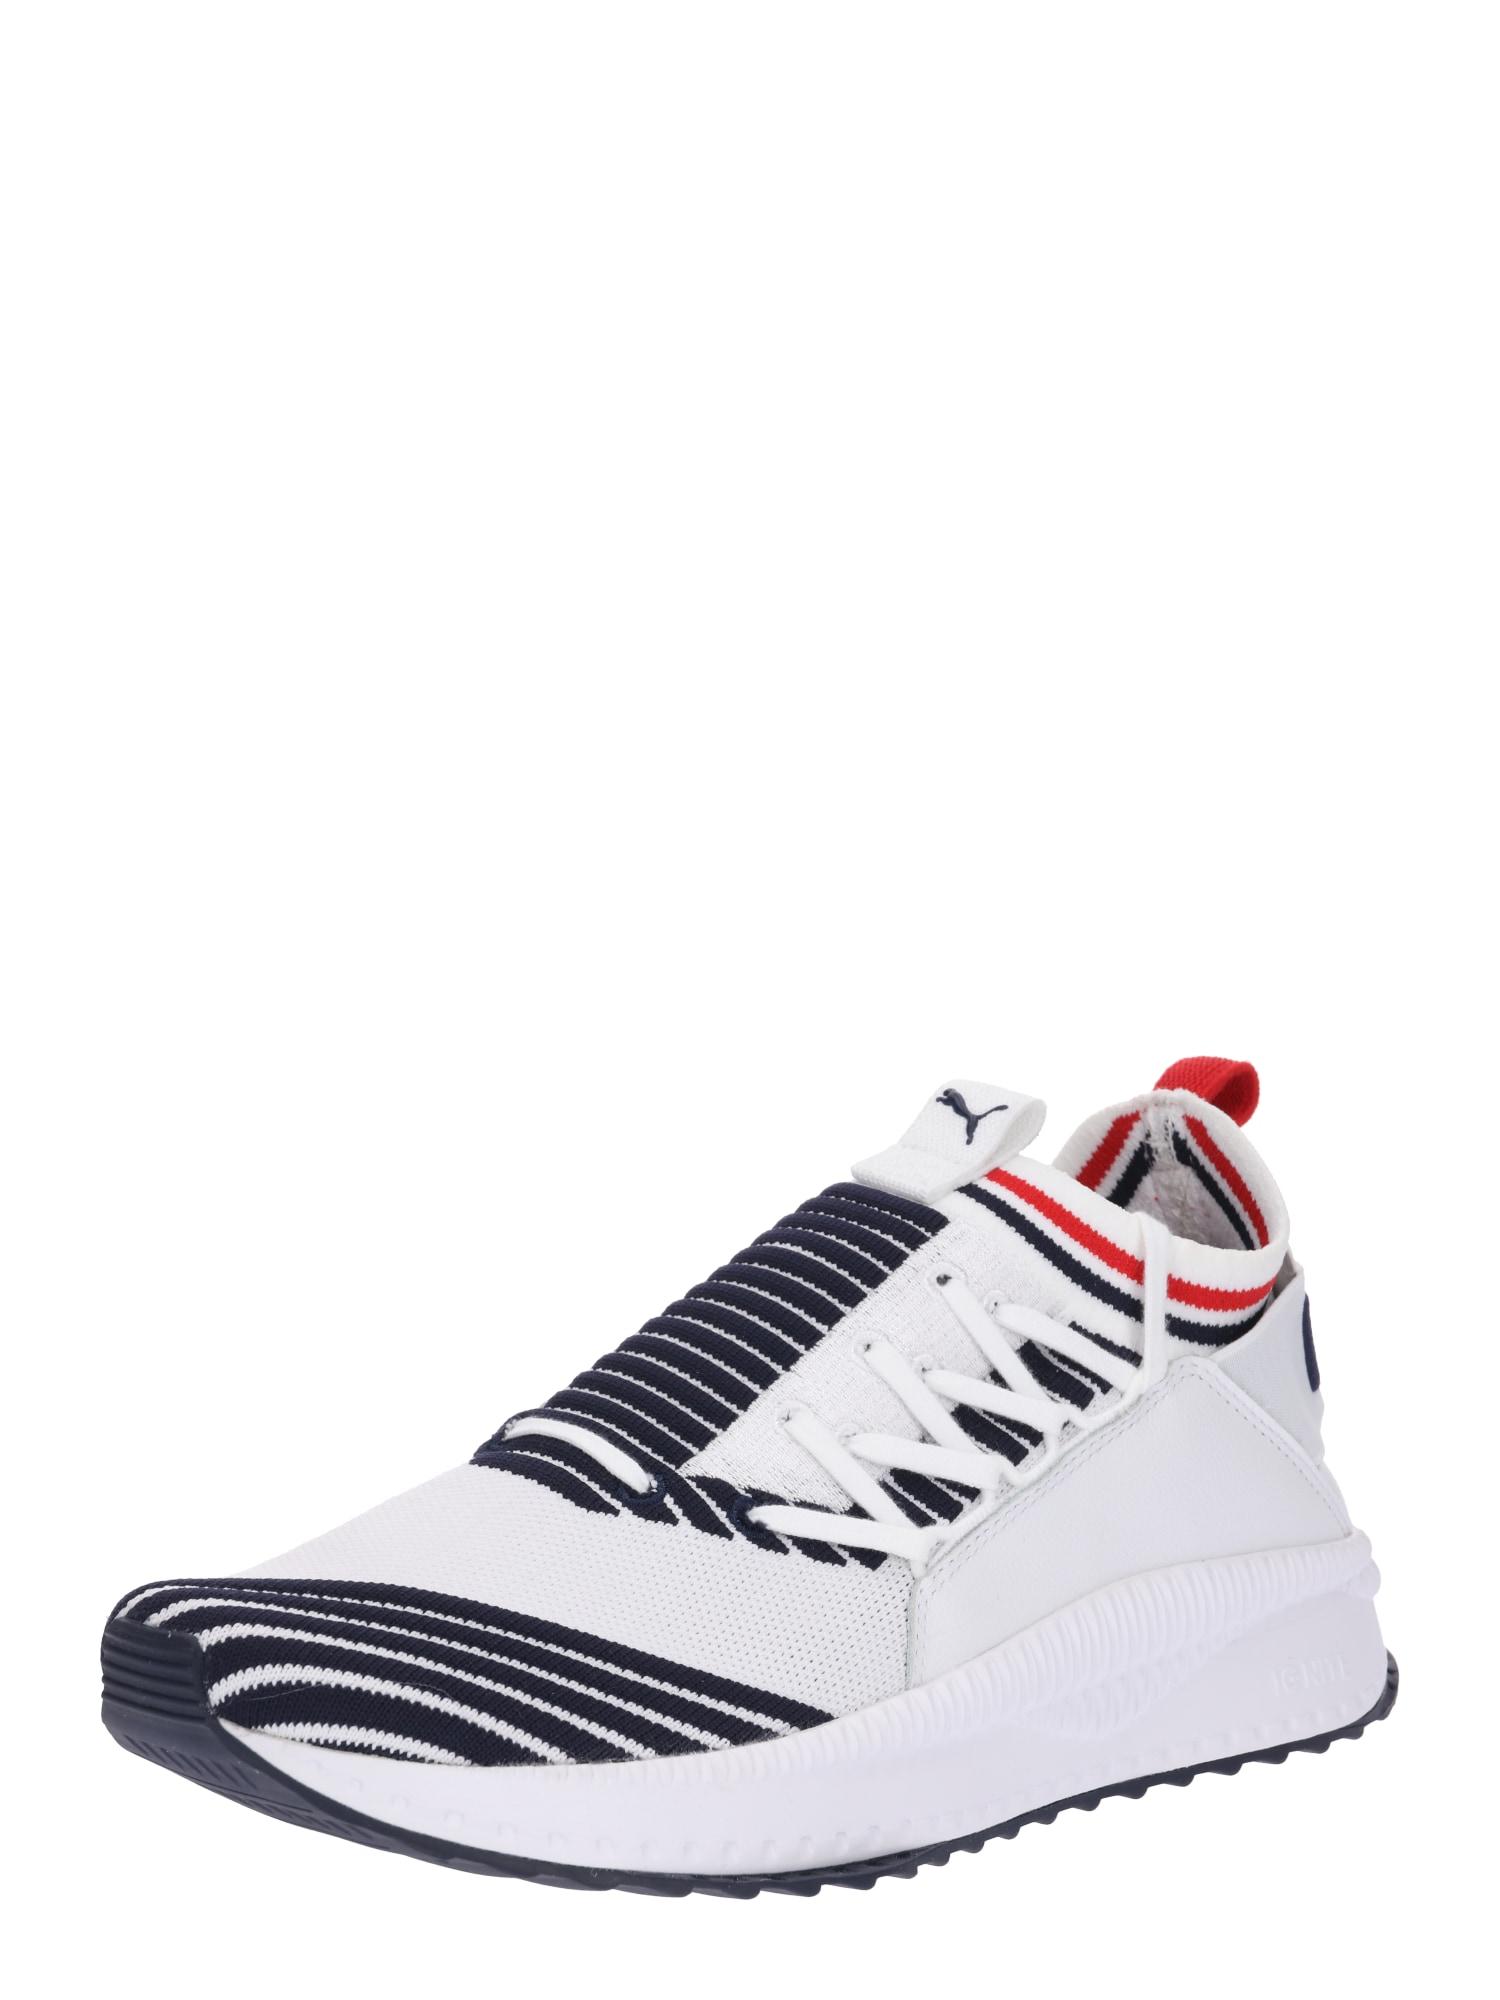 PUMA, Heren Sneakers laag 'TSUGI', marine / rood / wit